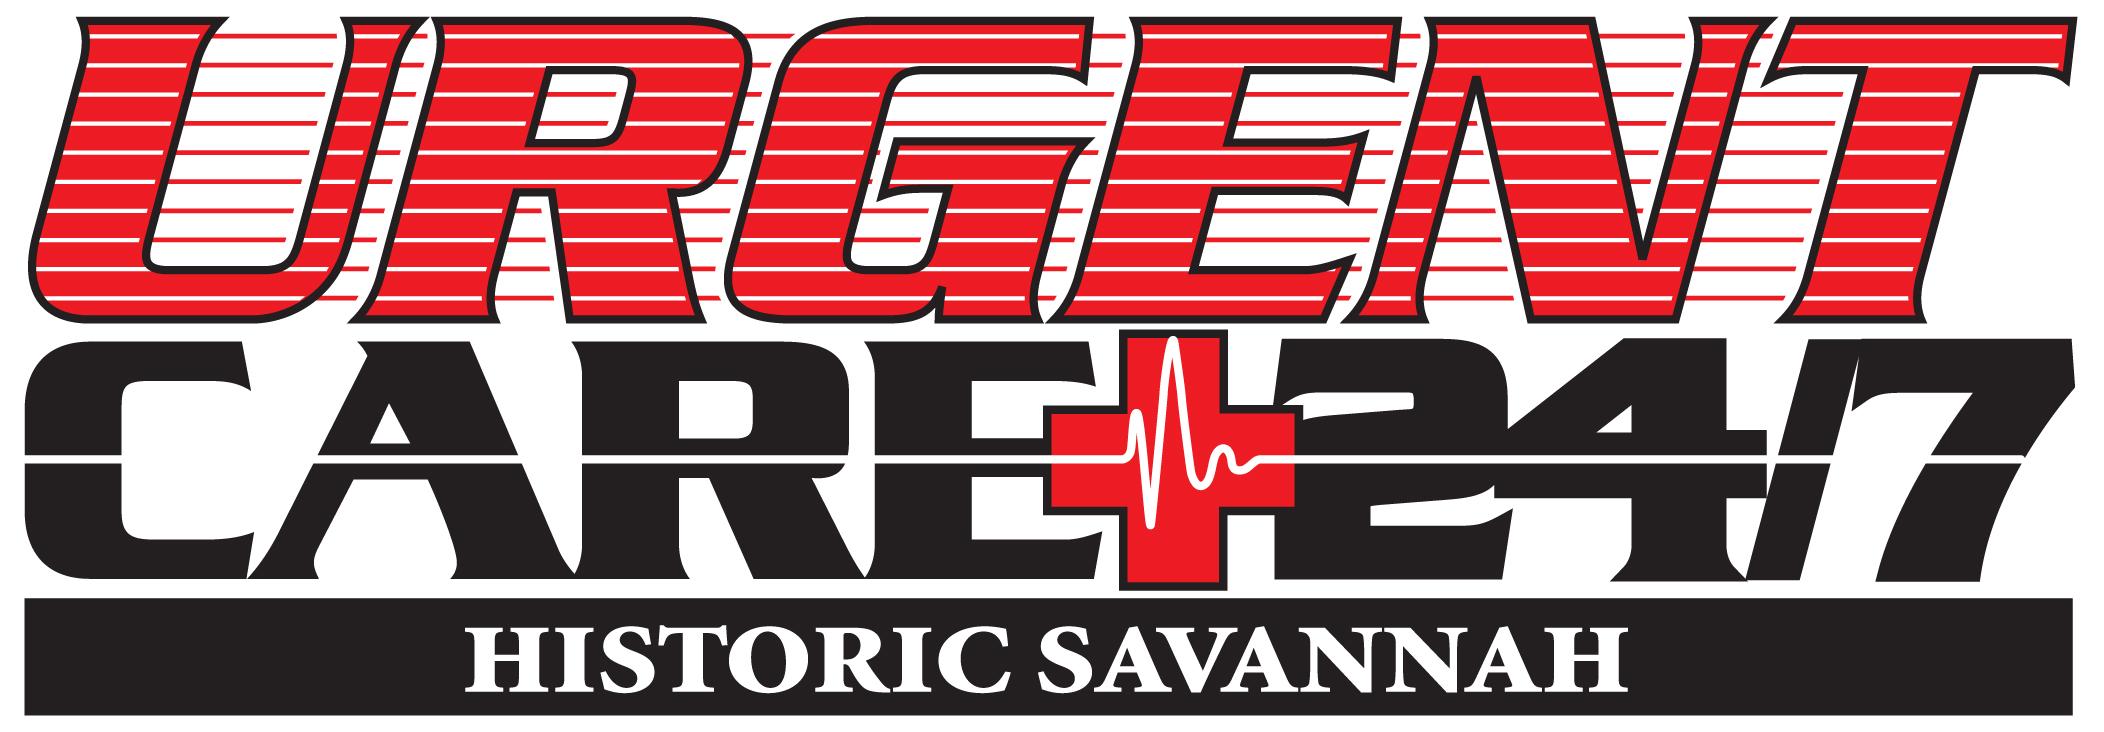 Urgent Care 24/7 Historic Savannah